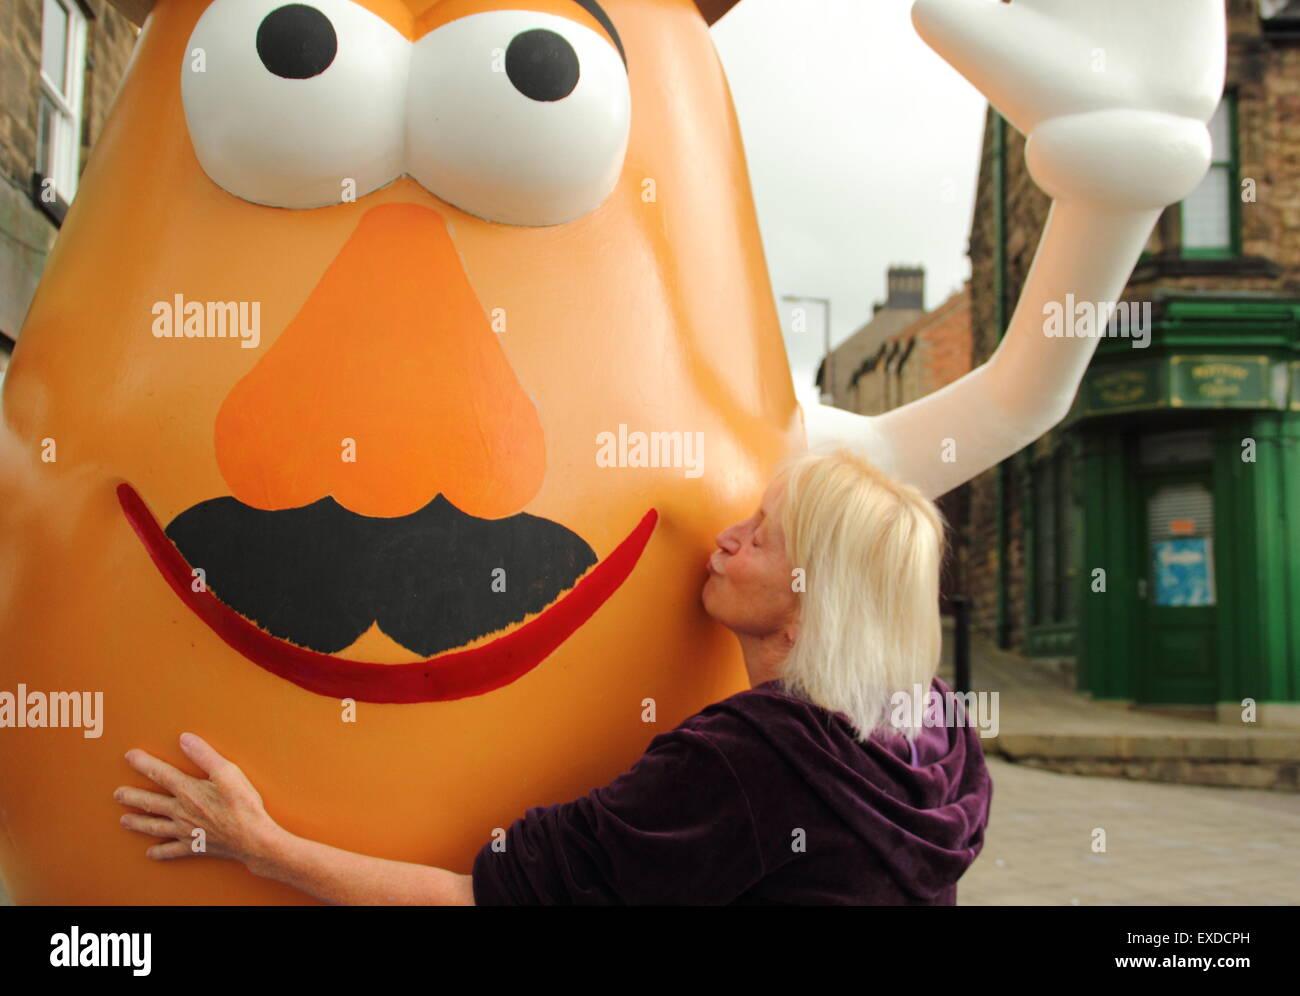 Belper, Derbyshire, UK. 12th July, 2015. Spud fan, Freda Raphael plants a kiss on a giant Mr Potato Head that has - Stock Image